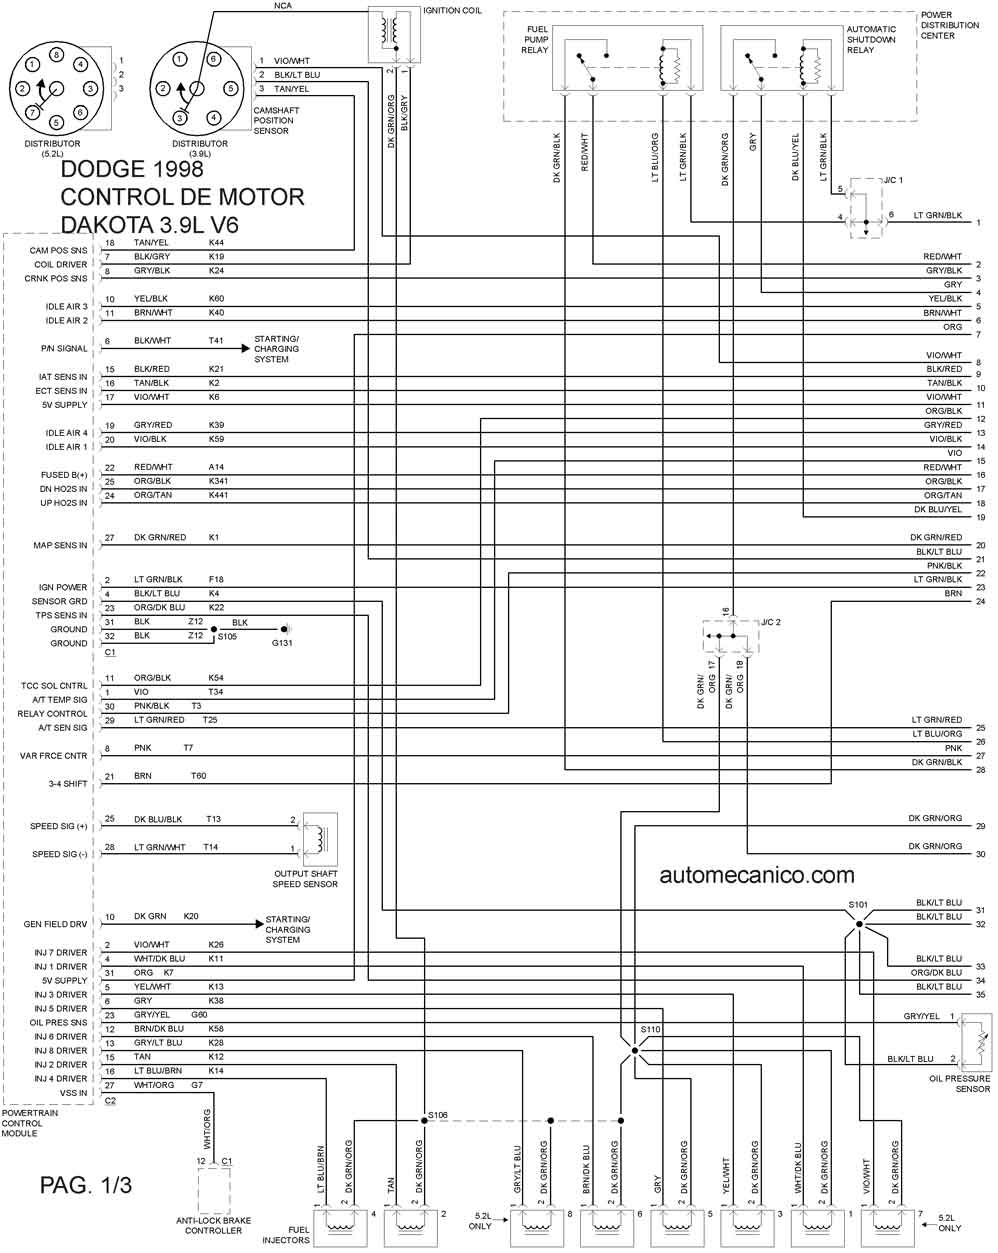 1998 dodge dakota diagrama de cableado